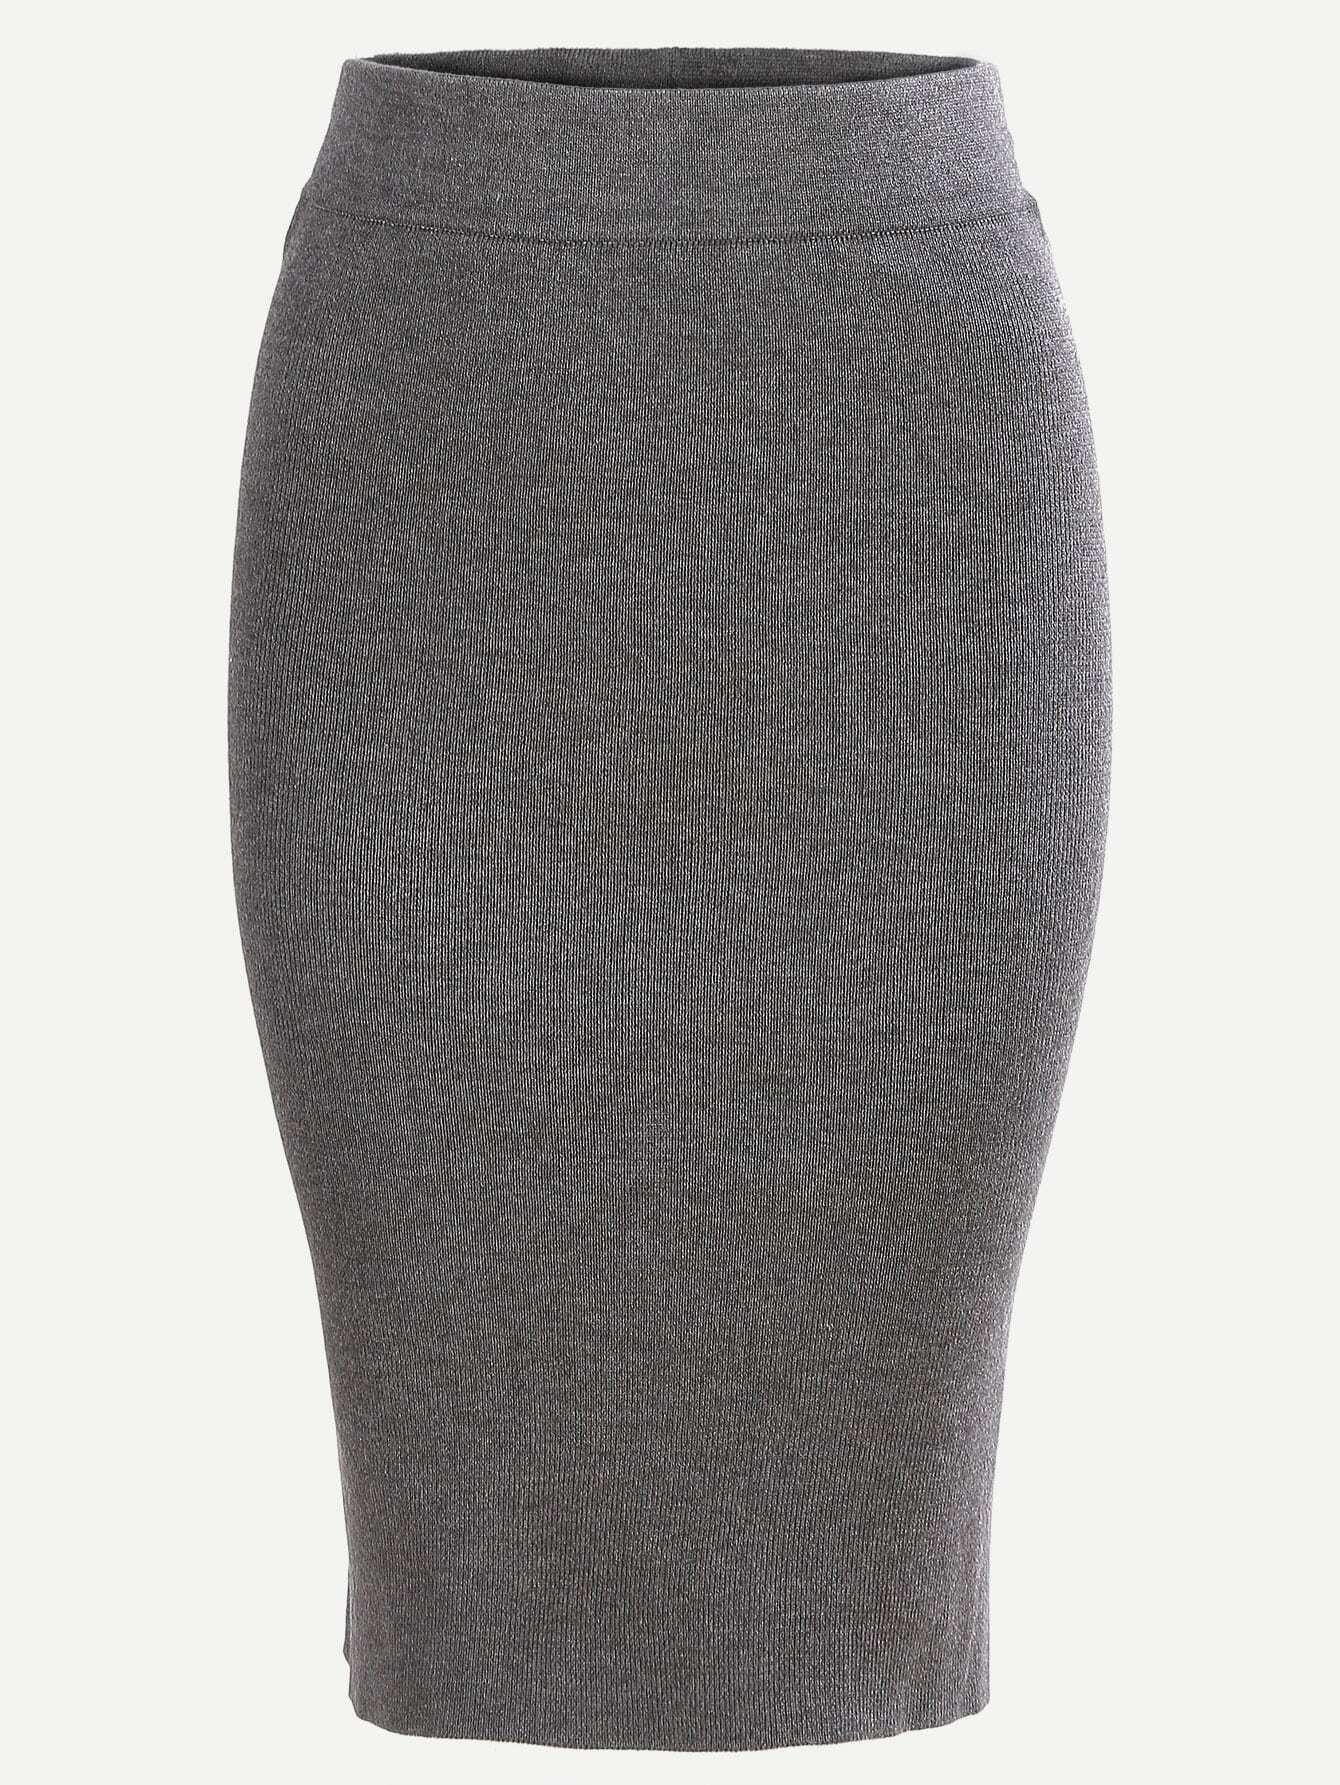 Grey Split Dual Pockets Knit Pencil Skirt